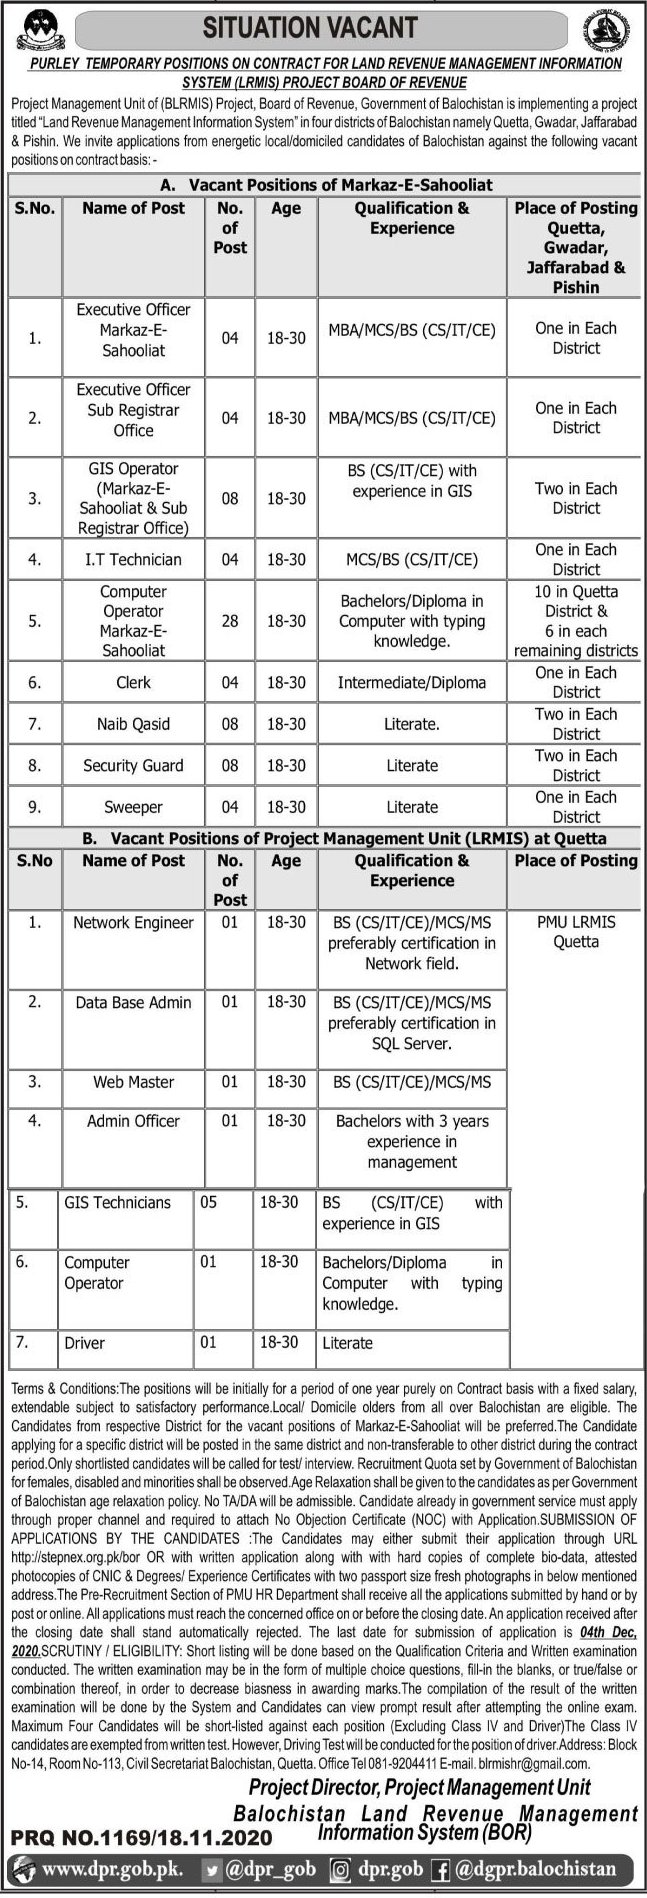 Project Management Unit PMU Jobs in Pakistan For Primary, Middle, Matric, Intermediate Degree, Bachelor Degree, Master Degree - Online Apply - stepnex.org.pk/bor Jobs 2021